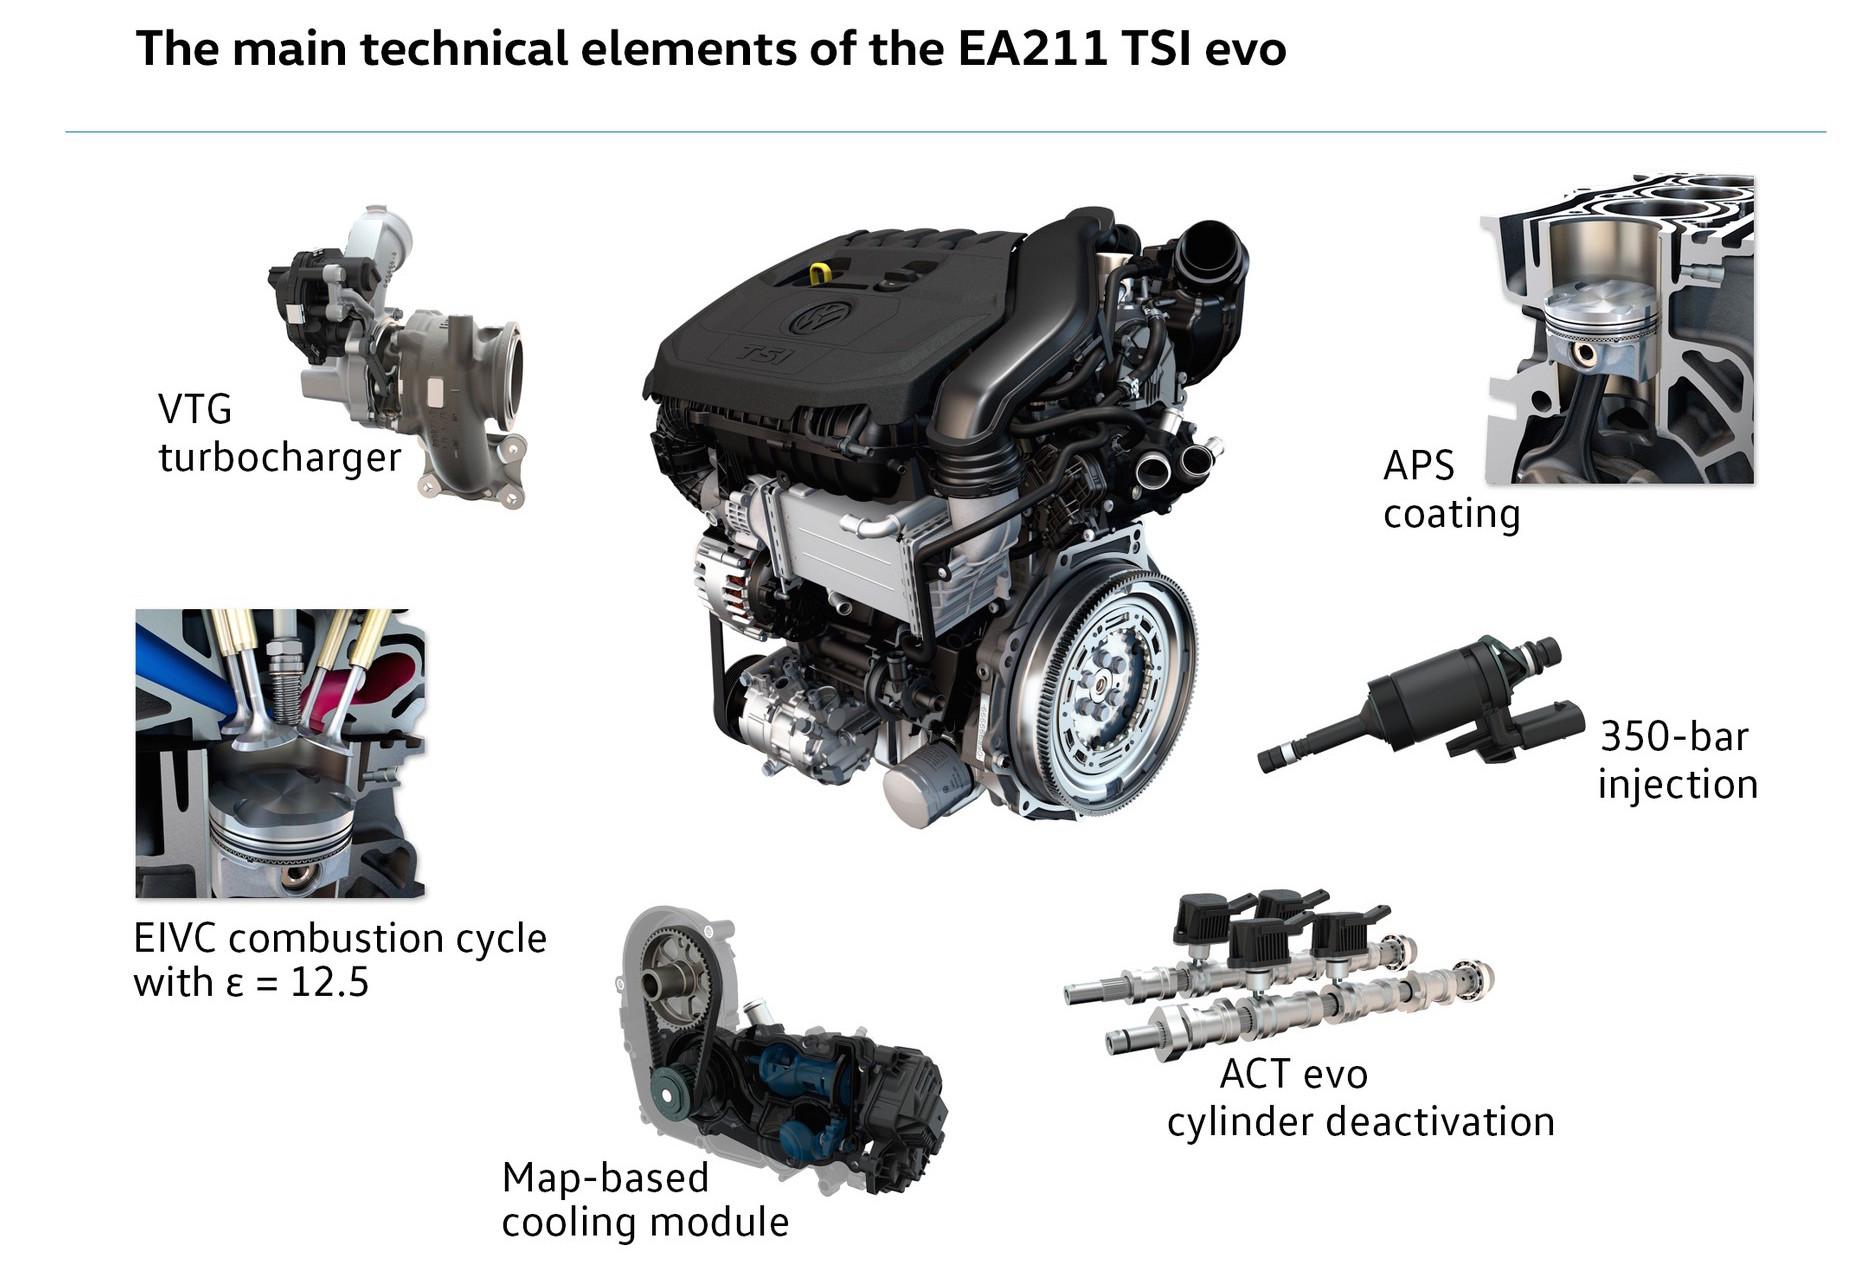 Evo Engine Diagram Wiring Library Jc 120 Ignition 2016 Volkswagen 15 Tsi